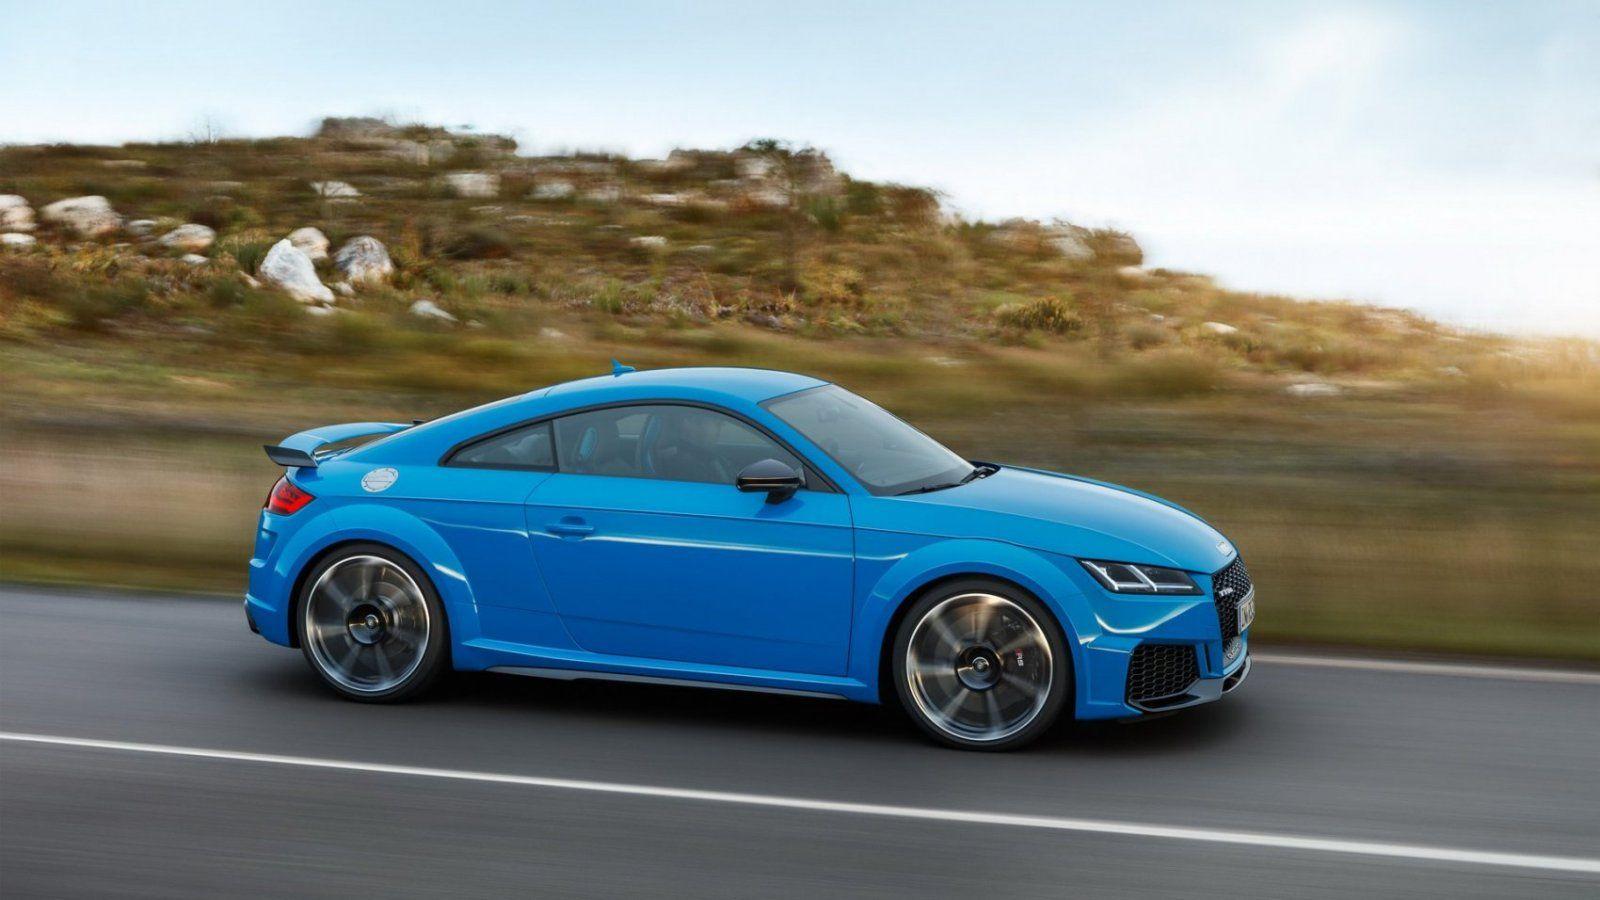 Refreshed 2020 Audi Tt Rs To Debut In New York Latest News Car Revs Daily Com Audi Tt Rs Audi Tt Audi